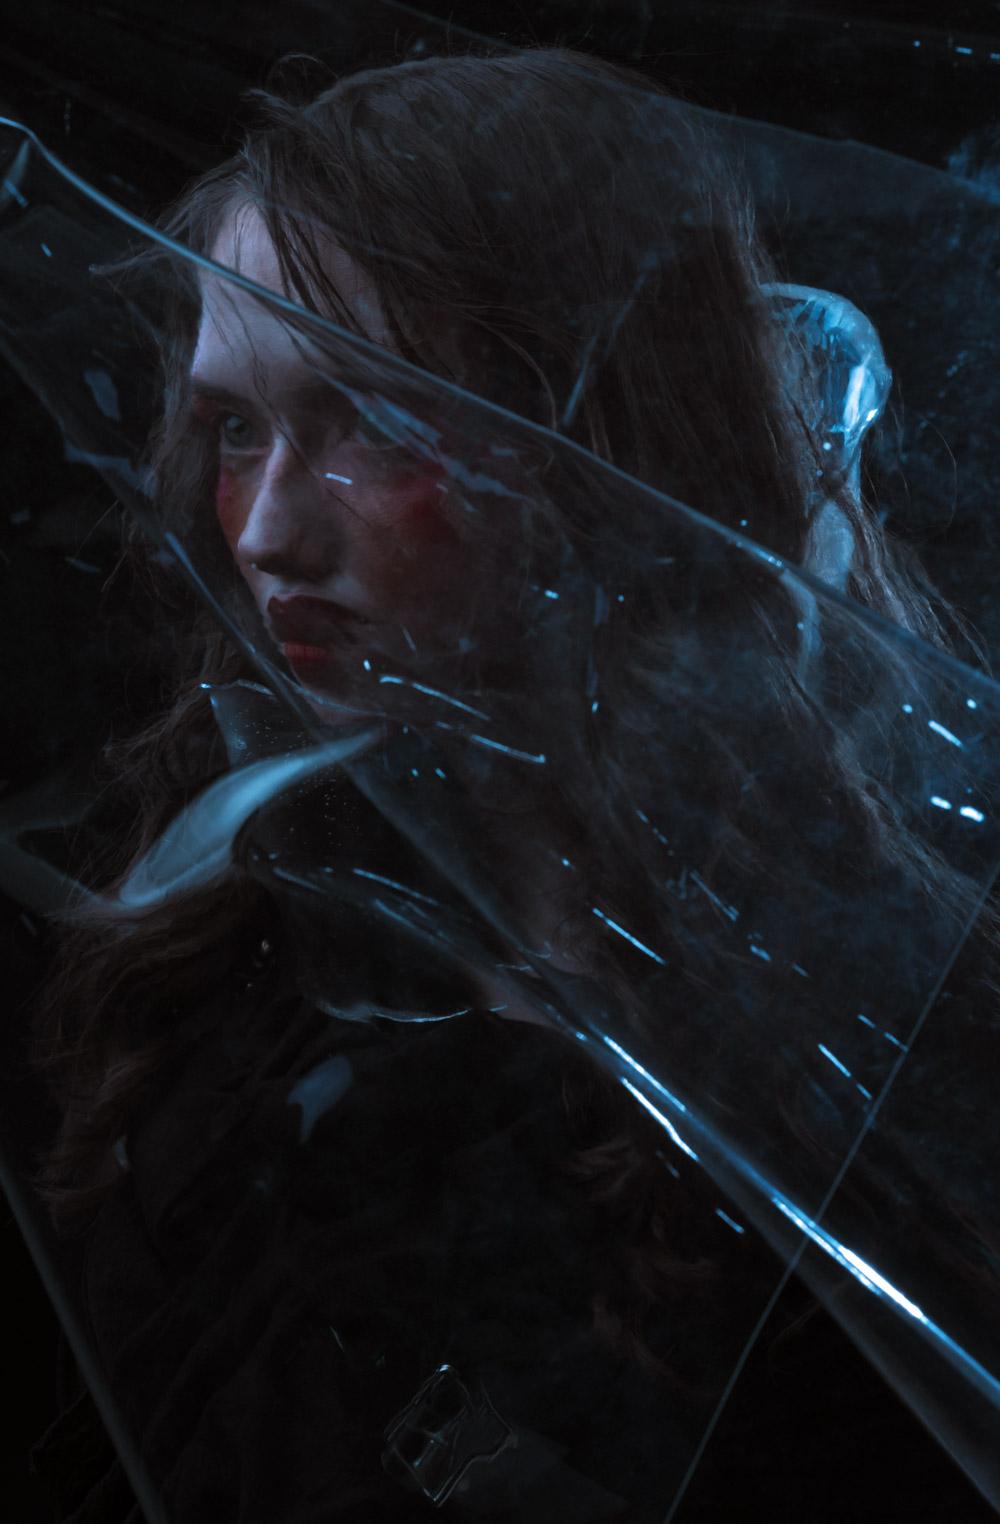 Alexander-Berdin-Lazursky-Visual-Atelier-8-8.jpg